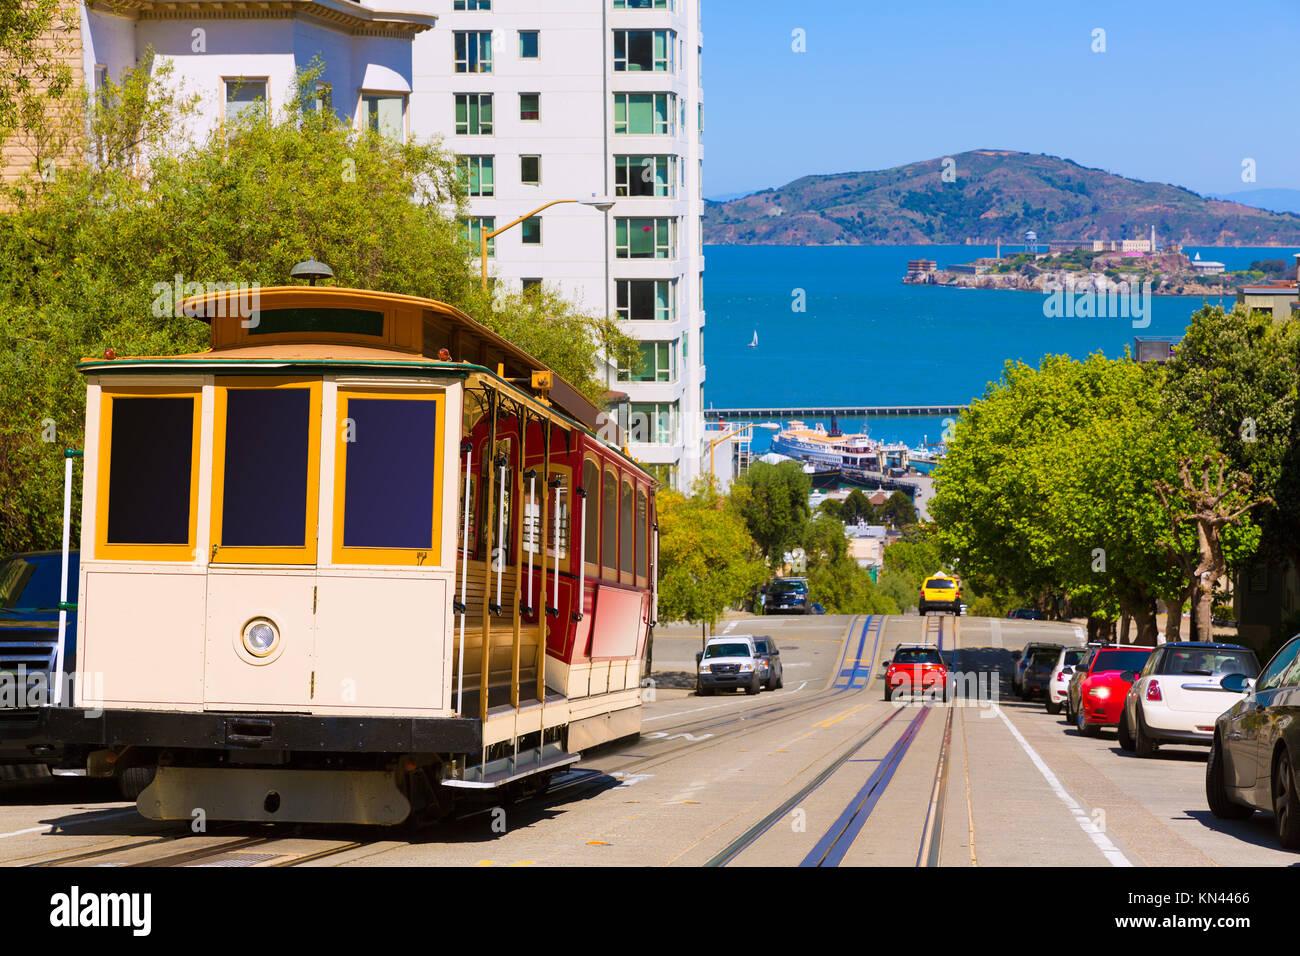 San Francisco Hyde Street Cable Car Bahn der Powell-Hyde in Kalifornien, USA. Stockbild